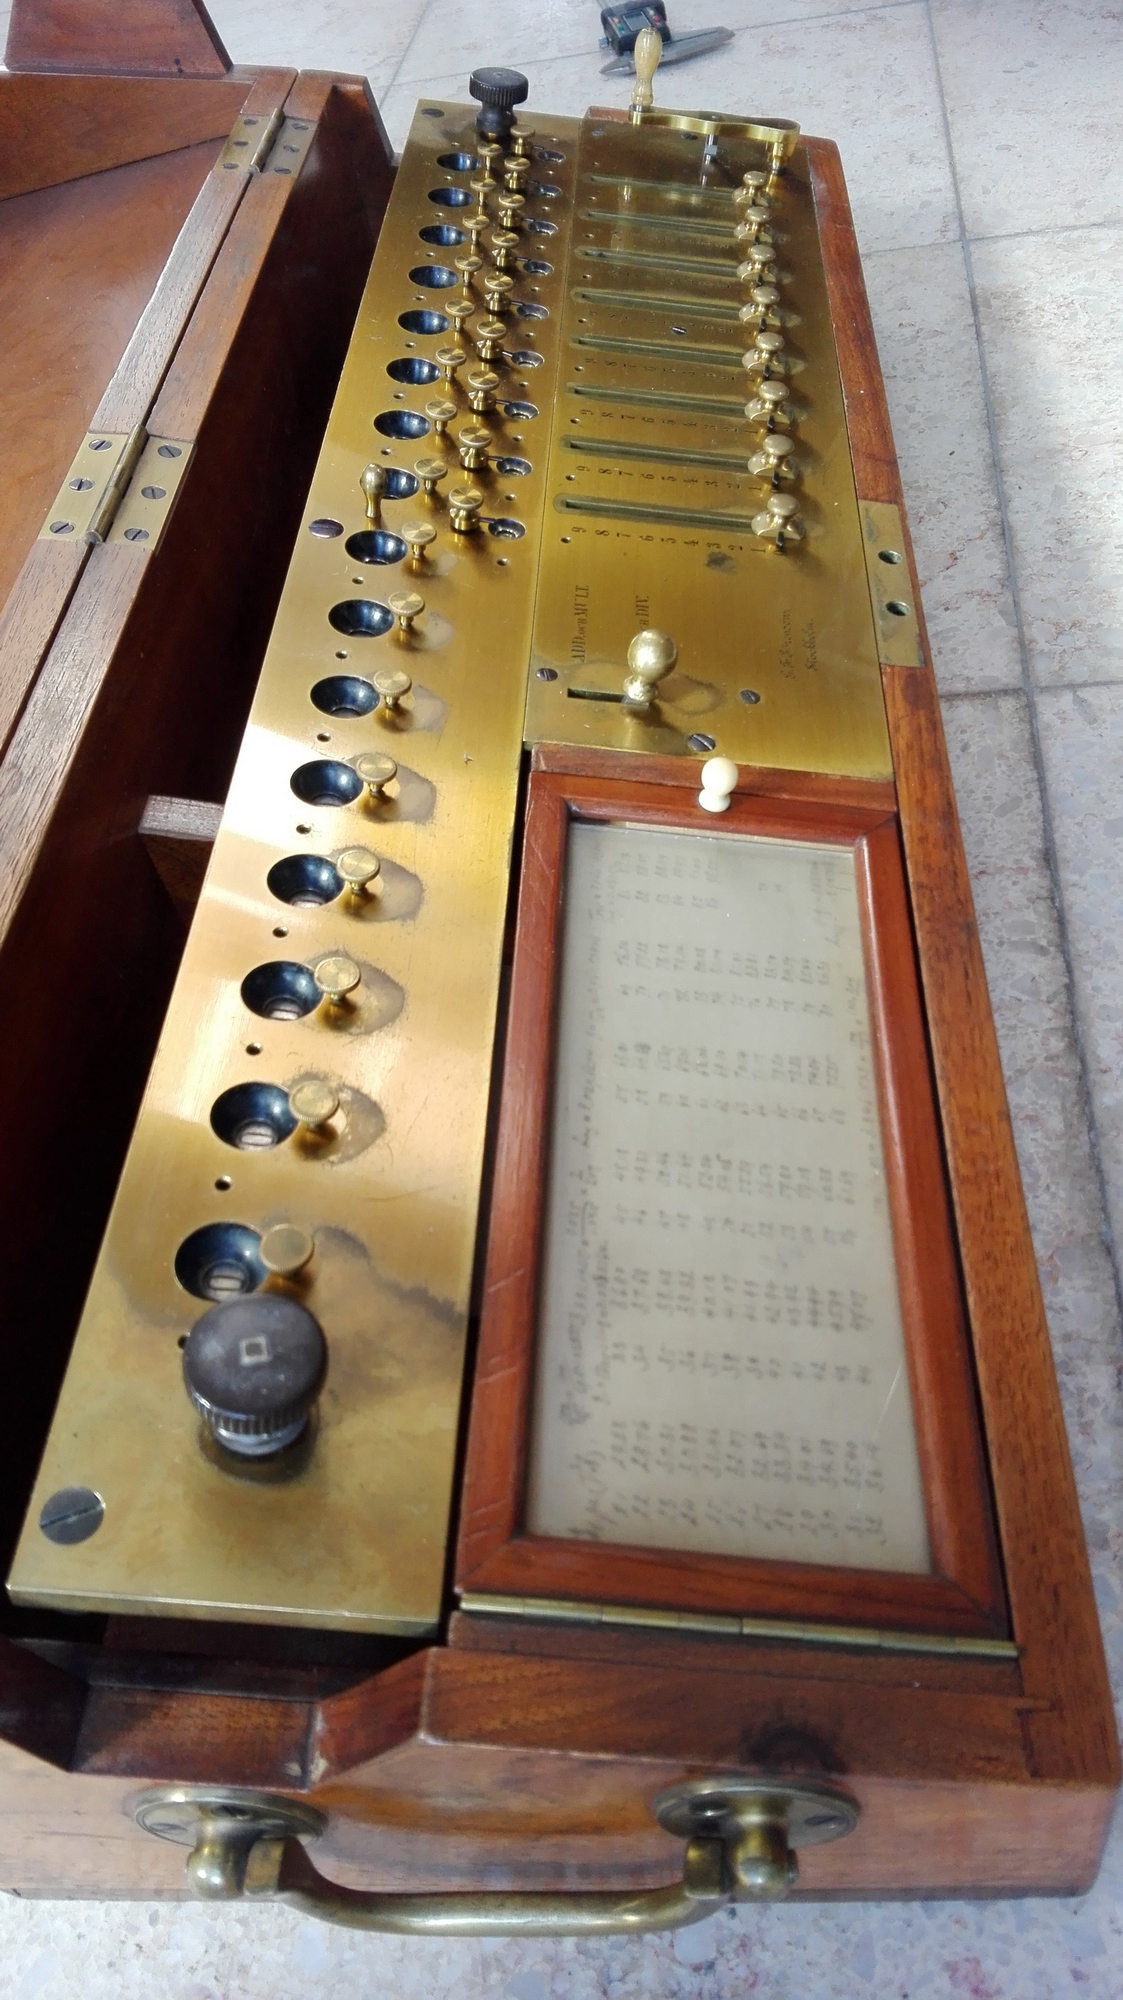 Sörensen Calculator picture 1